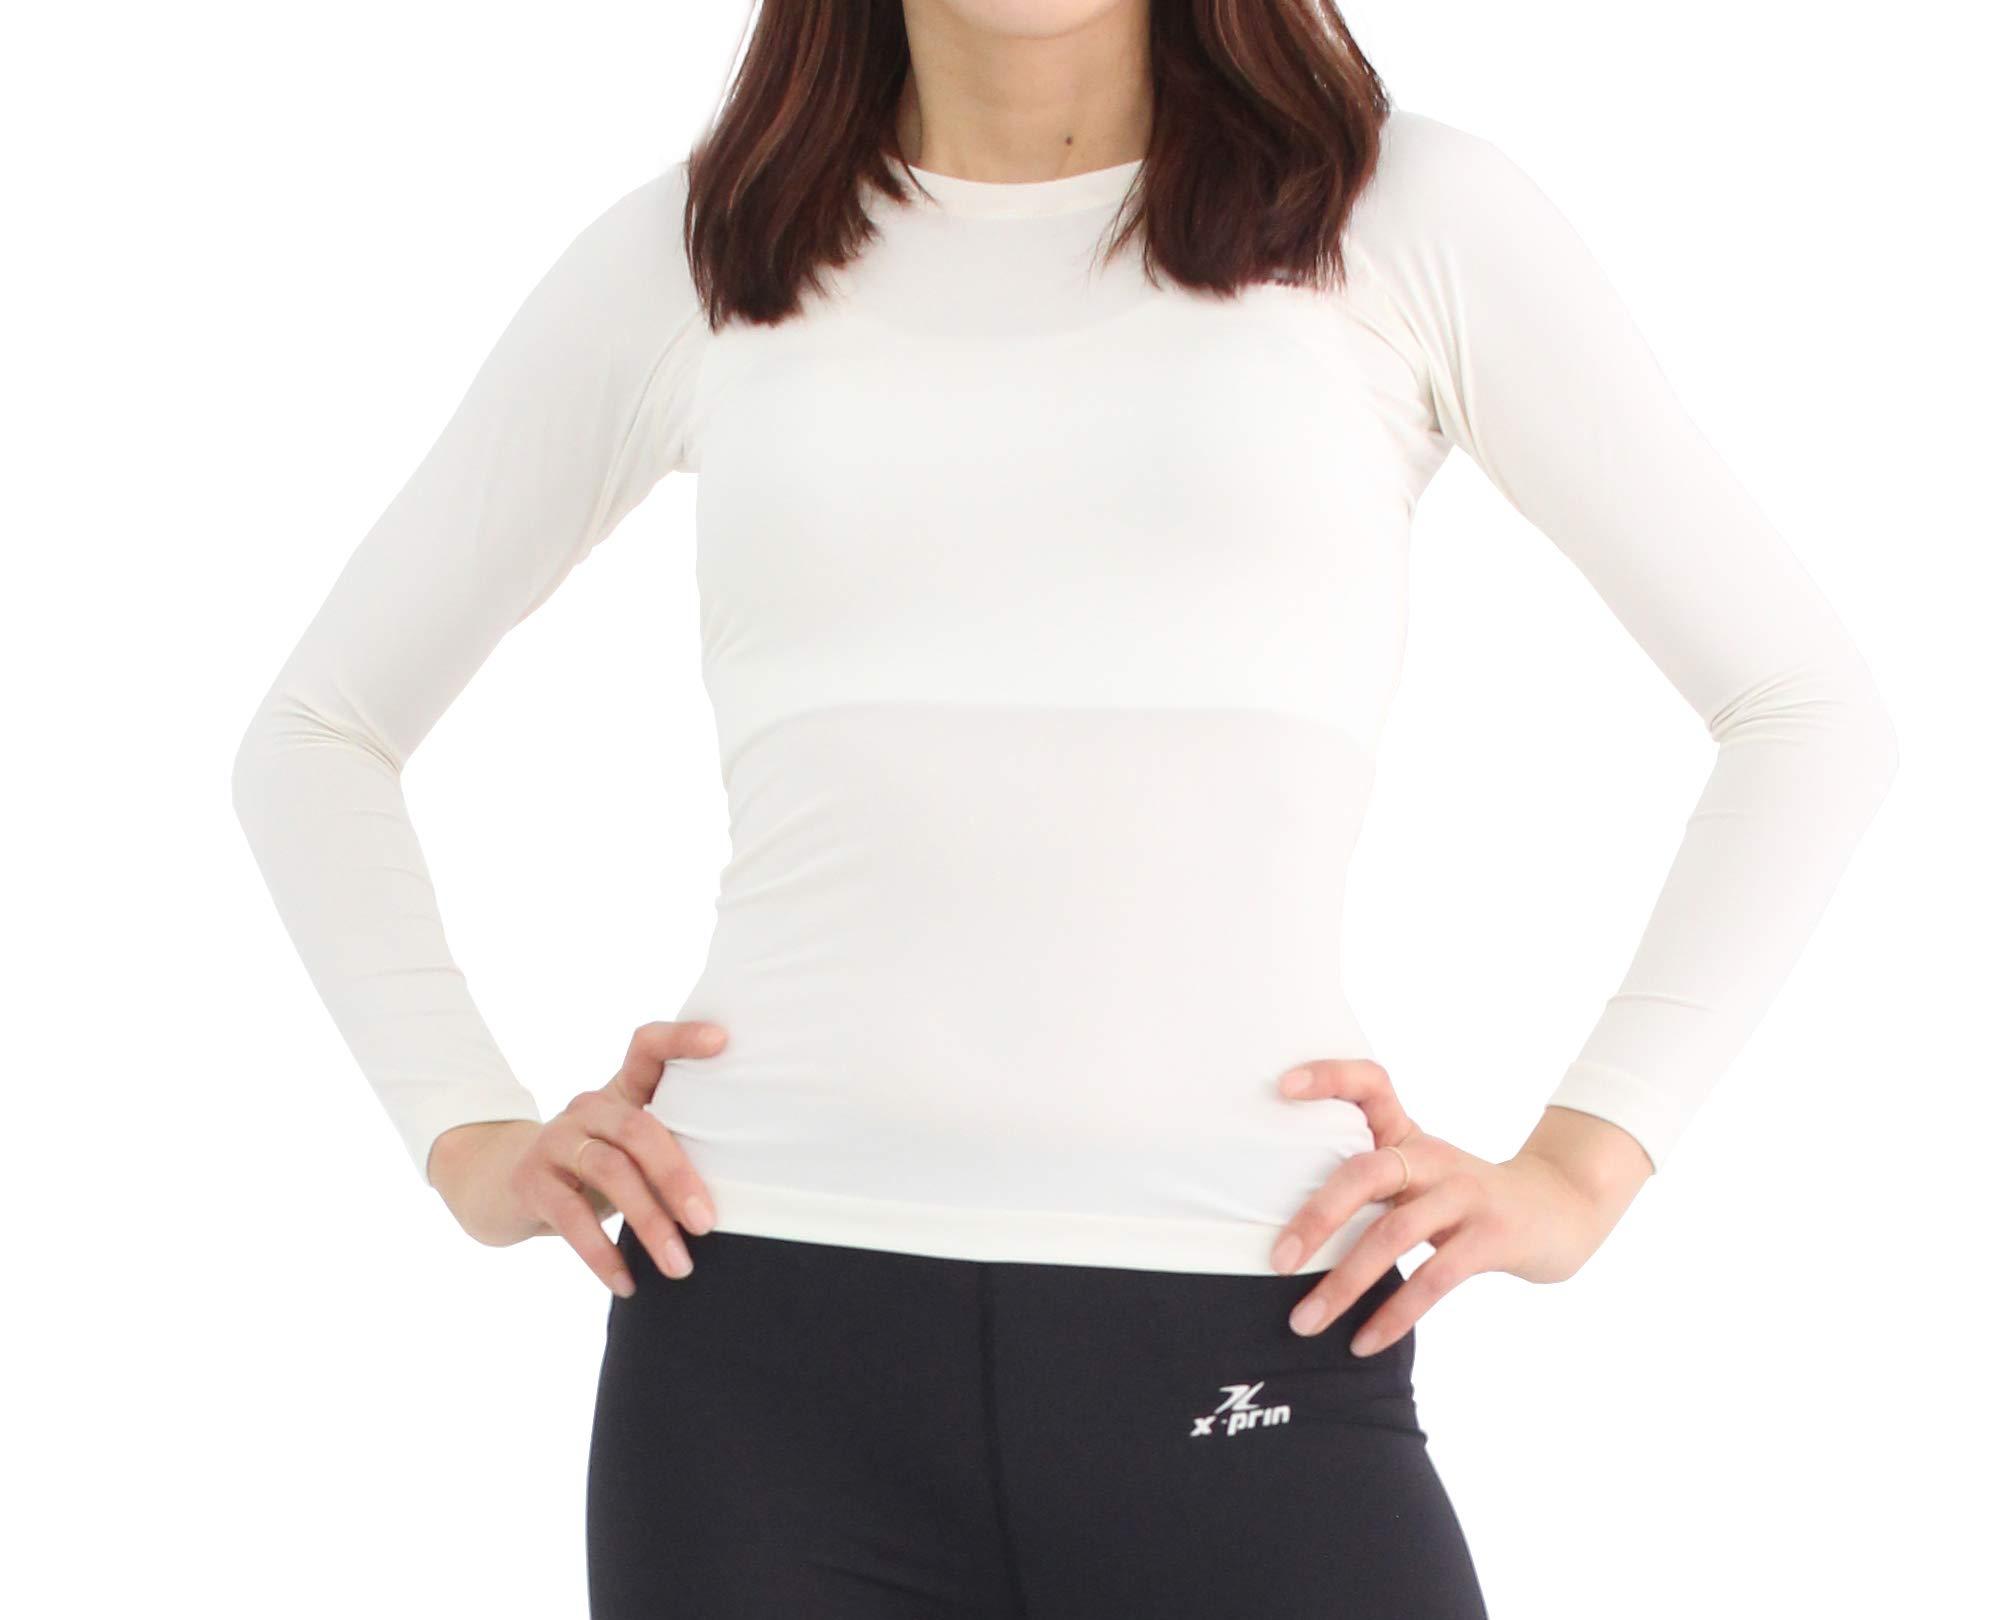 XPRIN A100 Series Women's Long Sleeve Cool Base Layer Compression Shirt Sports Wear (3XL, A102 White)